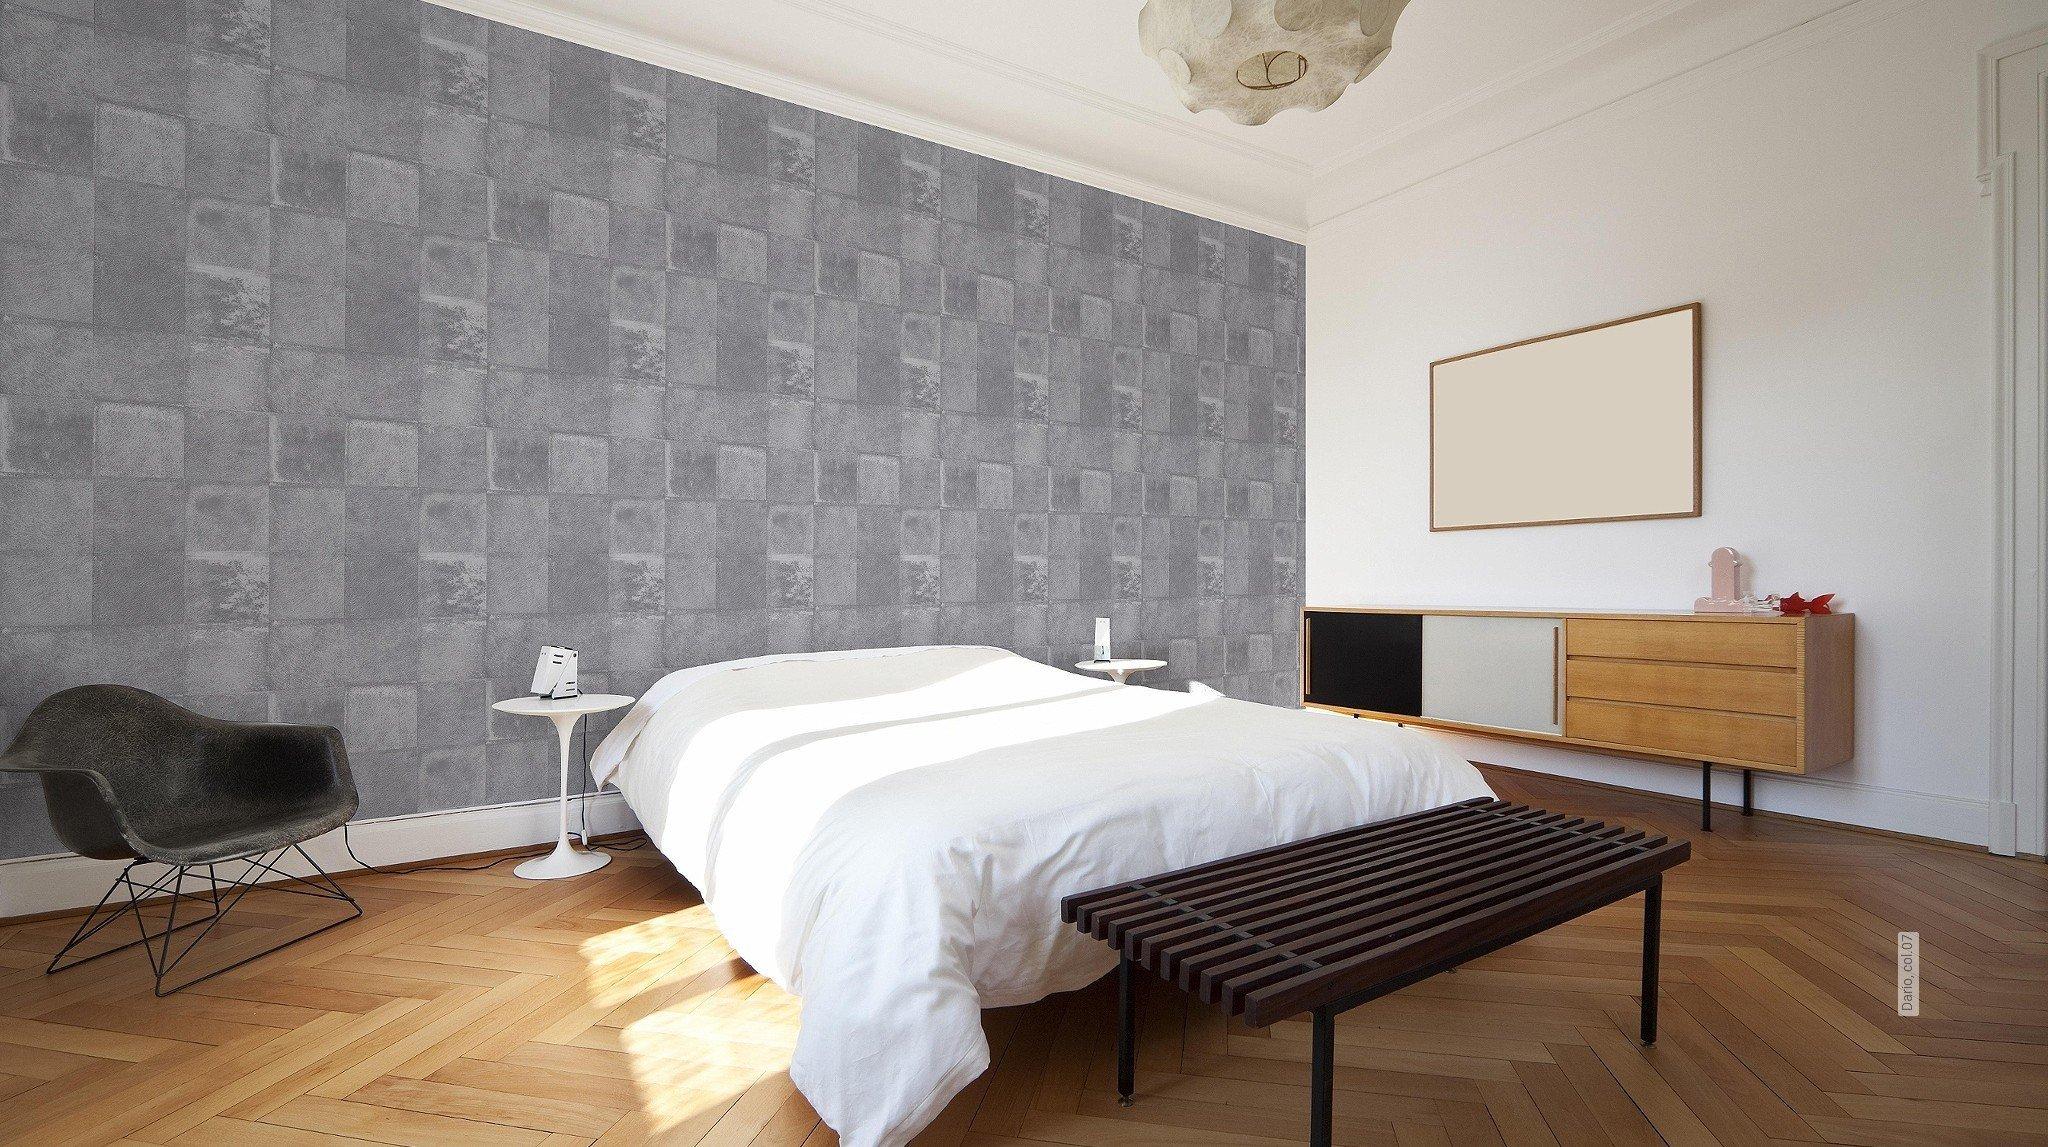 neue tapeten unsere neusten tapeten. Black Bedroom Furniture Sets. Home Design Ideas